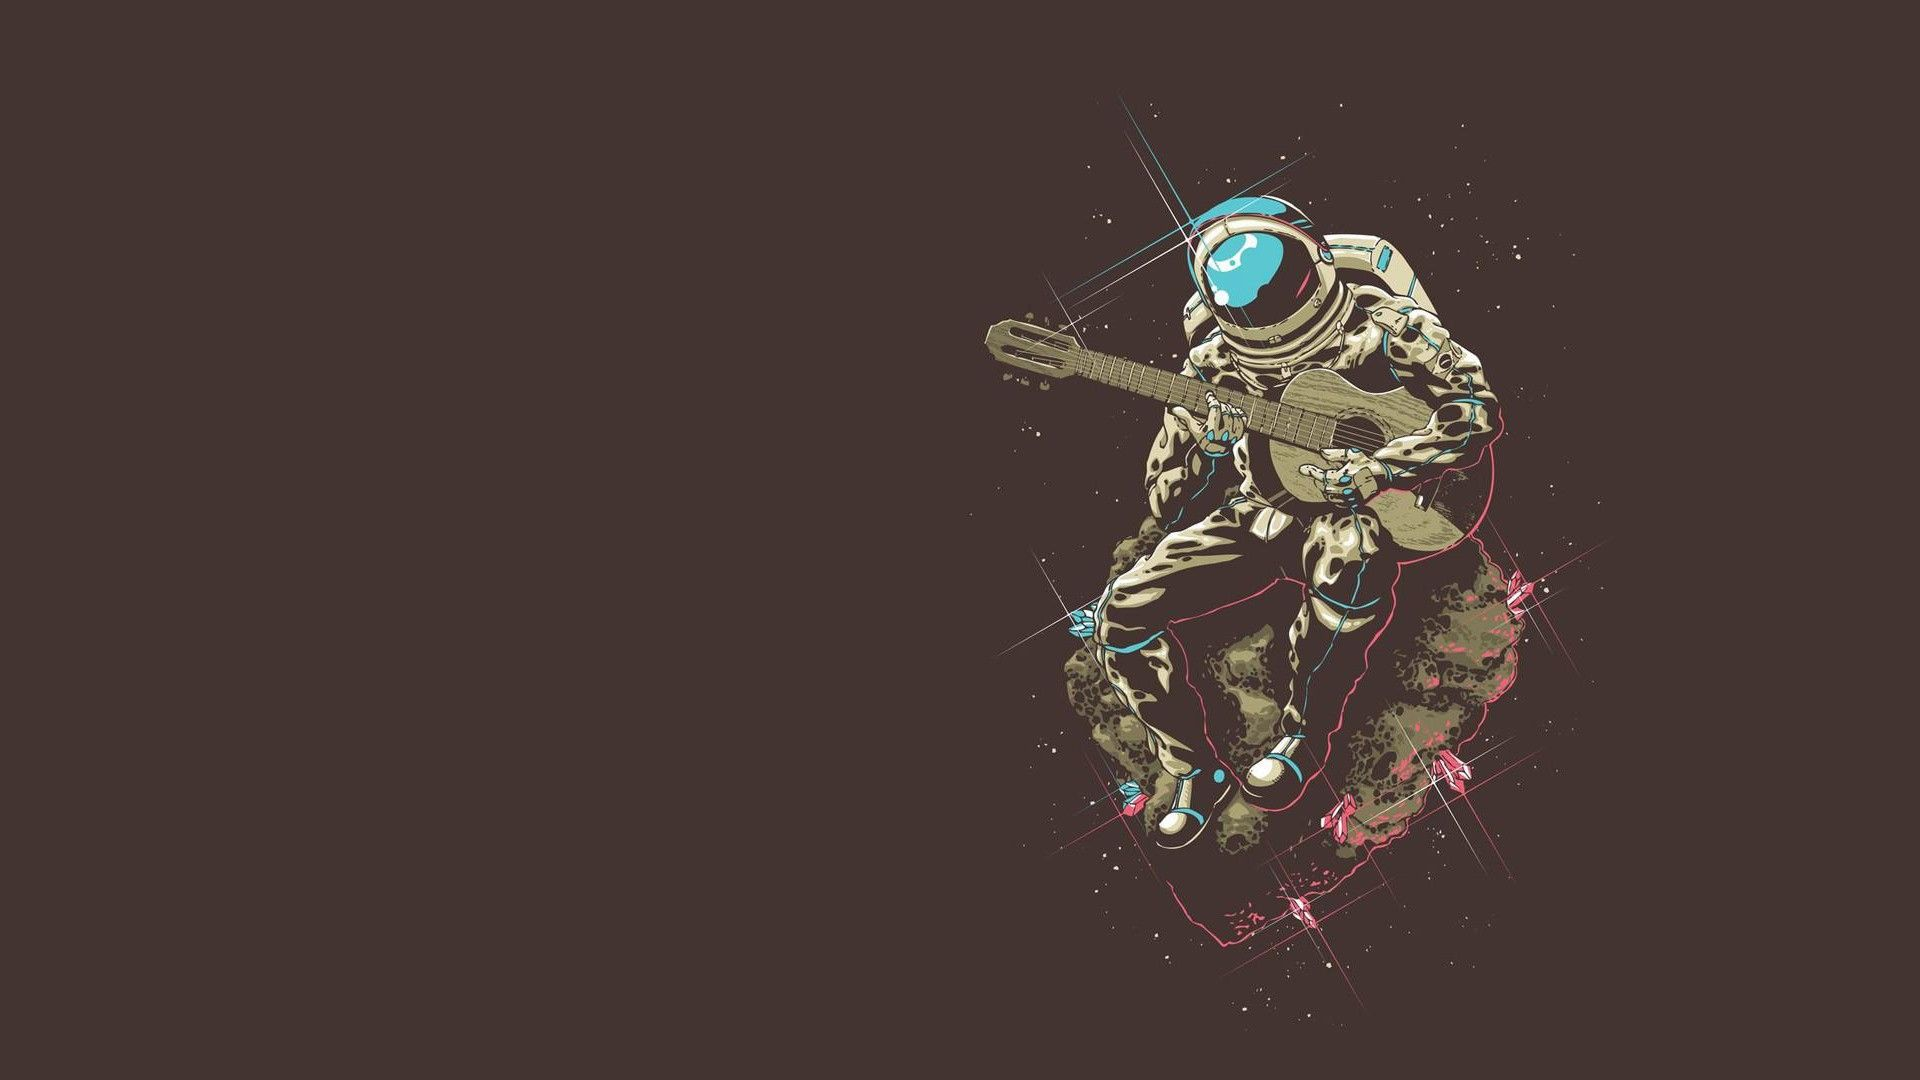 1920x1080 Minimalism Astronaut Space Guitar Asteroid Wallpaper Jpg 149 Kb Hd Wallpaper Astronaut Artwork Astronaut Tattoo